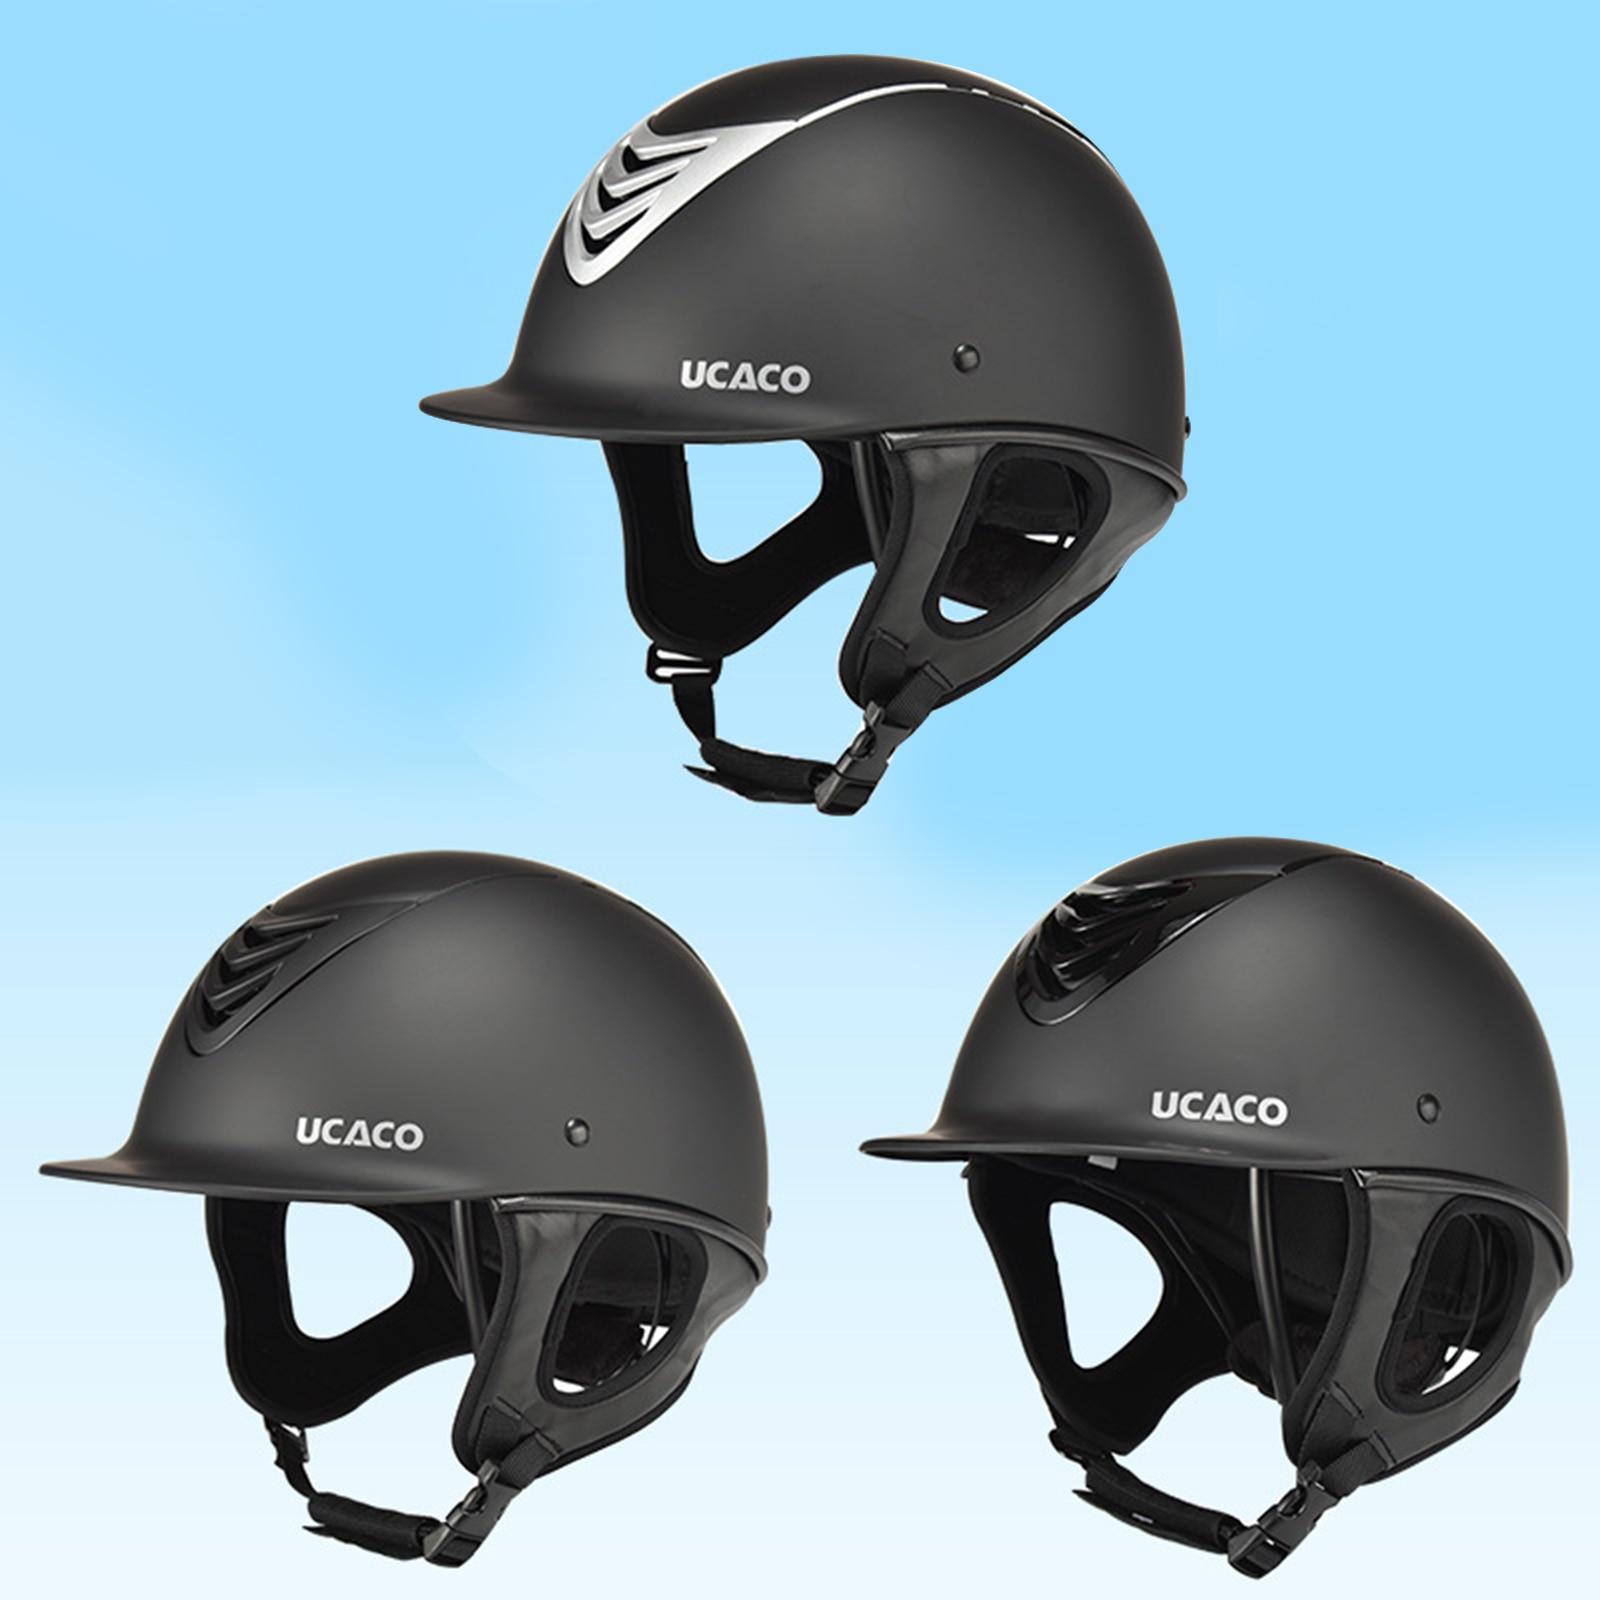 Equestrian Helmet Horse Riding Helmet Breathable Sportage Equestrian helmet Horse Riding Sport Helmets for Children and Adult